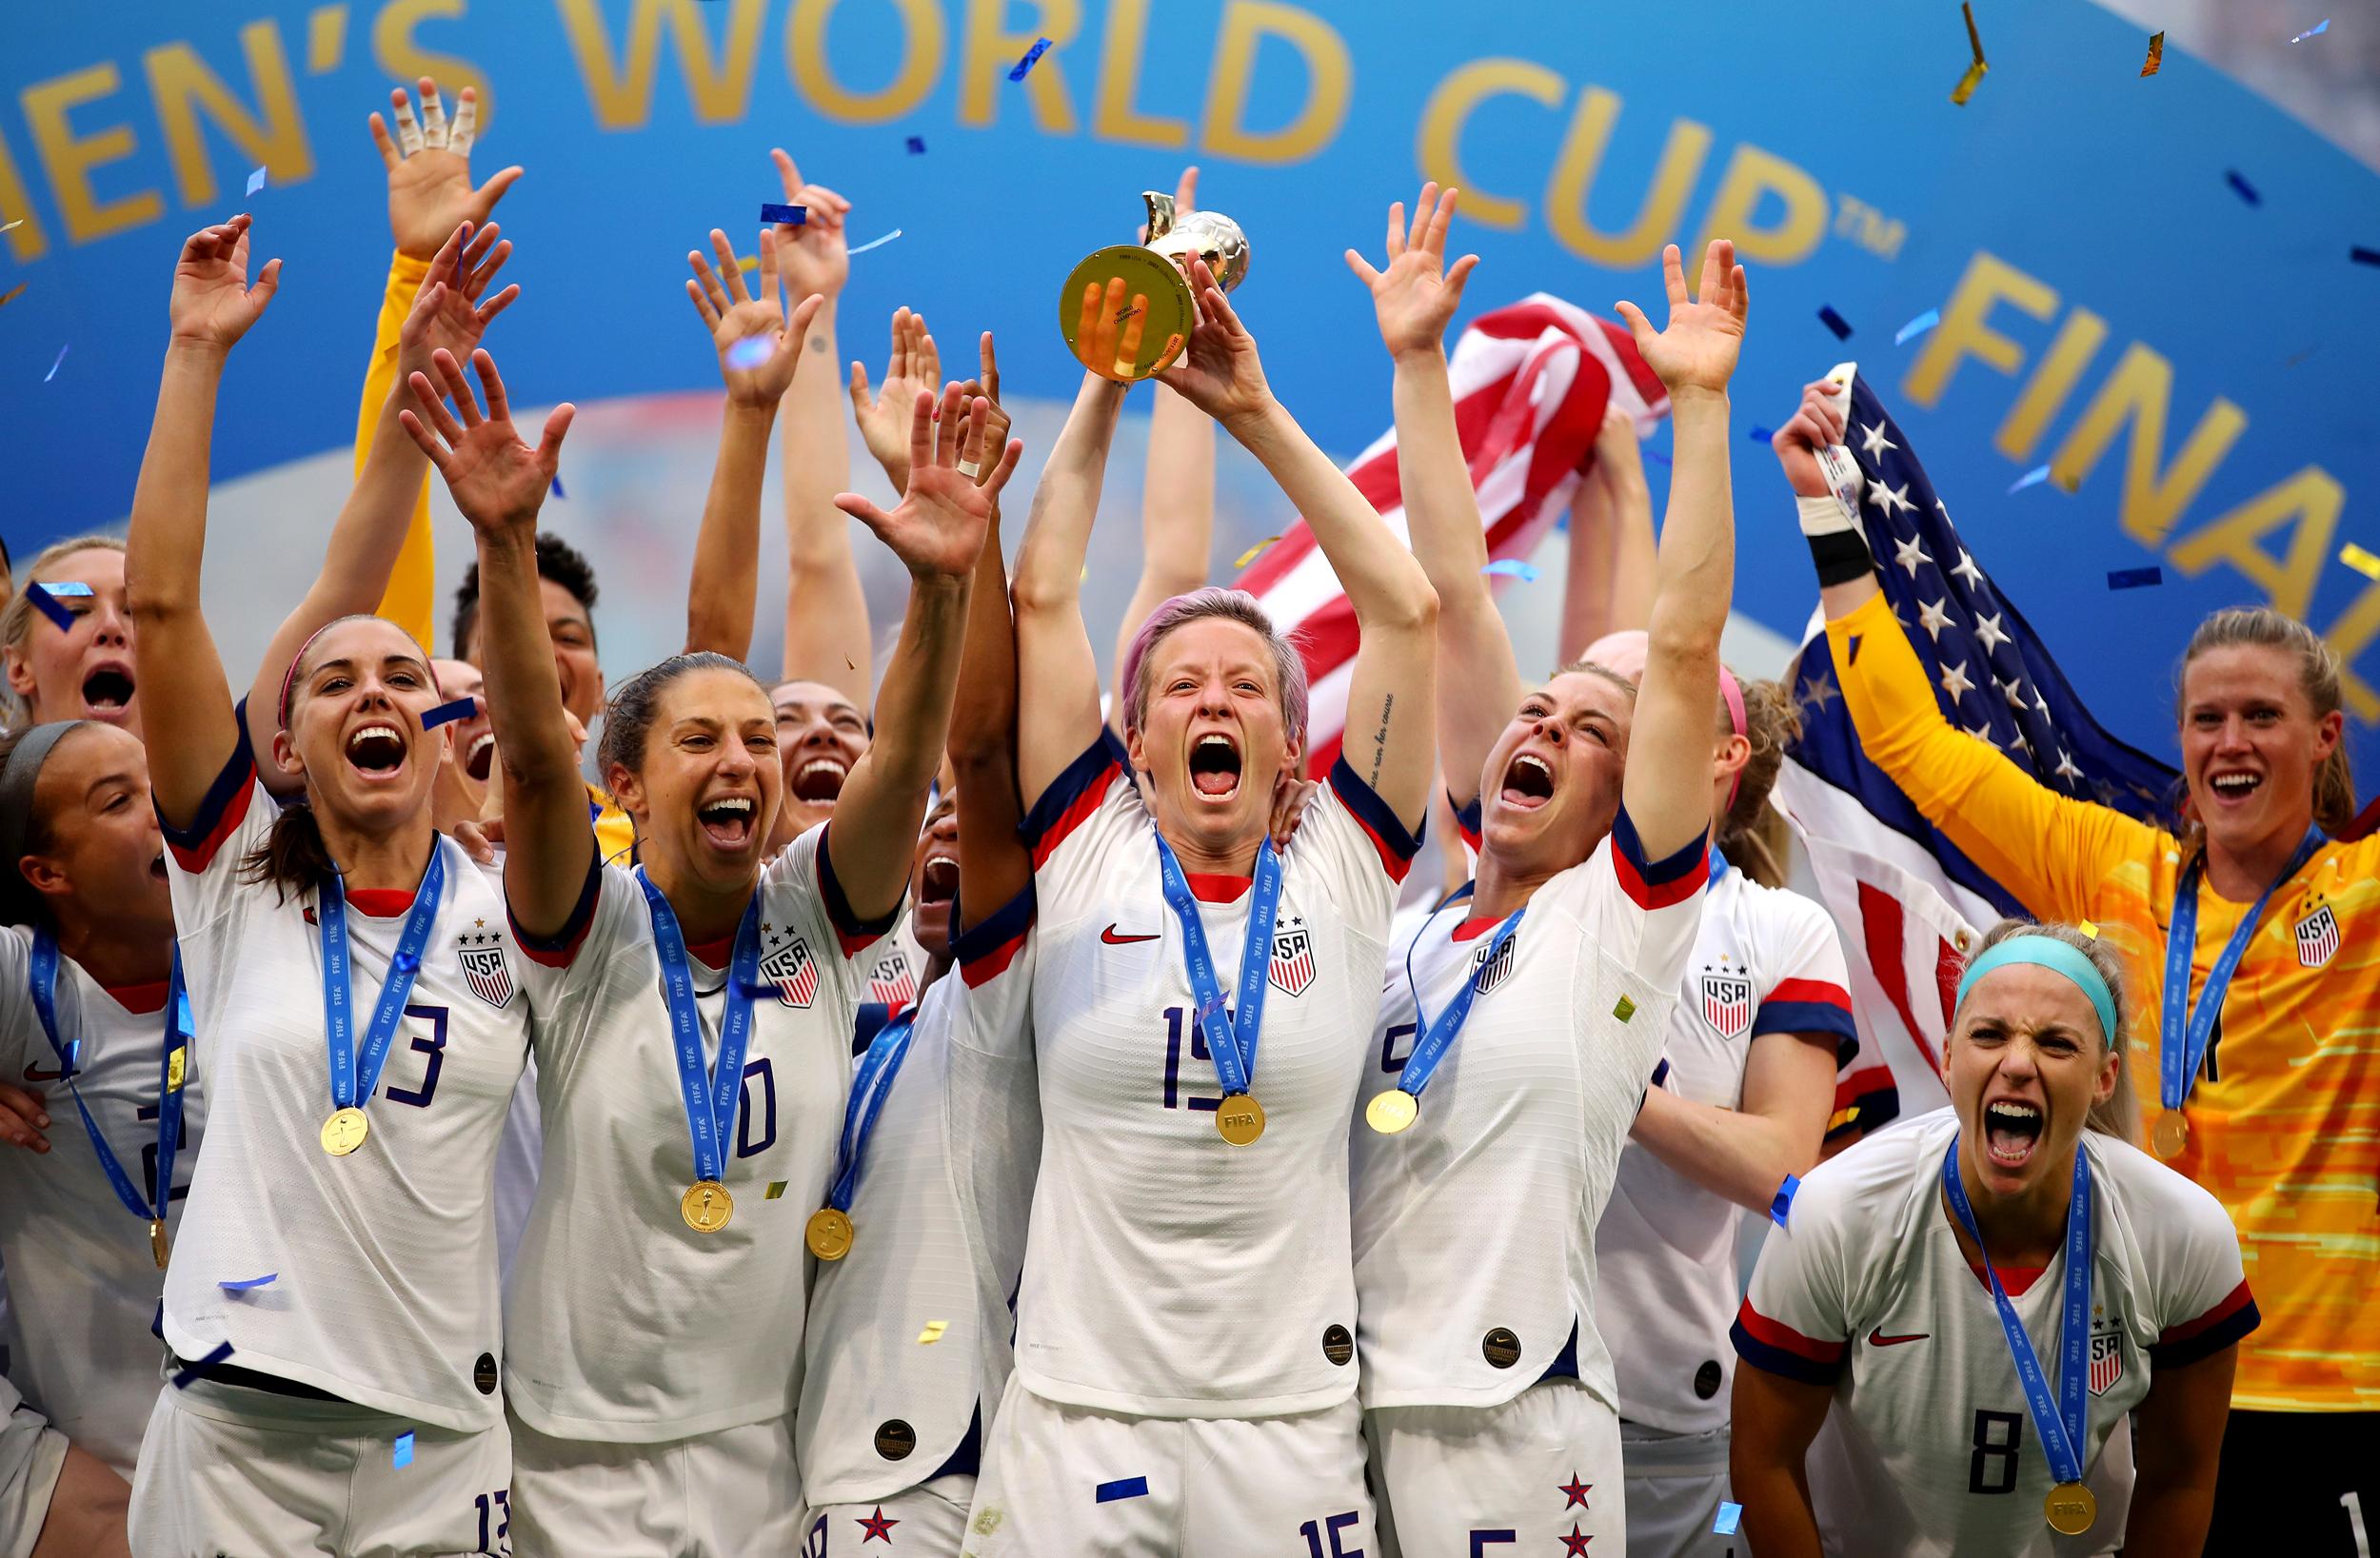 190707-uswnt-world-cup-celebration-cs-138p_fa7255f58400158eab37fd083f57666e.jpg